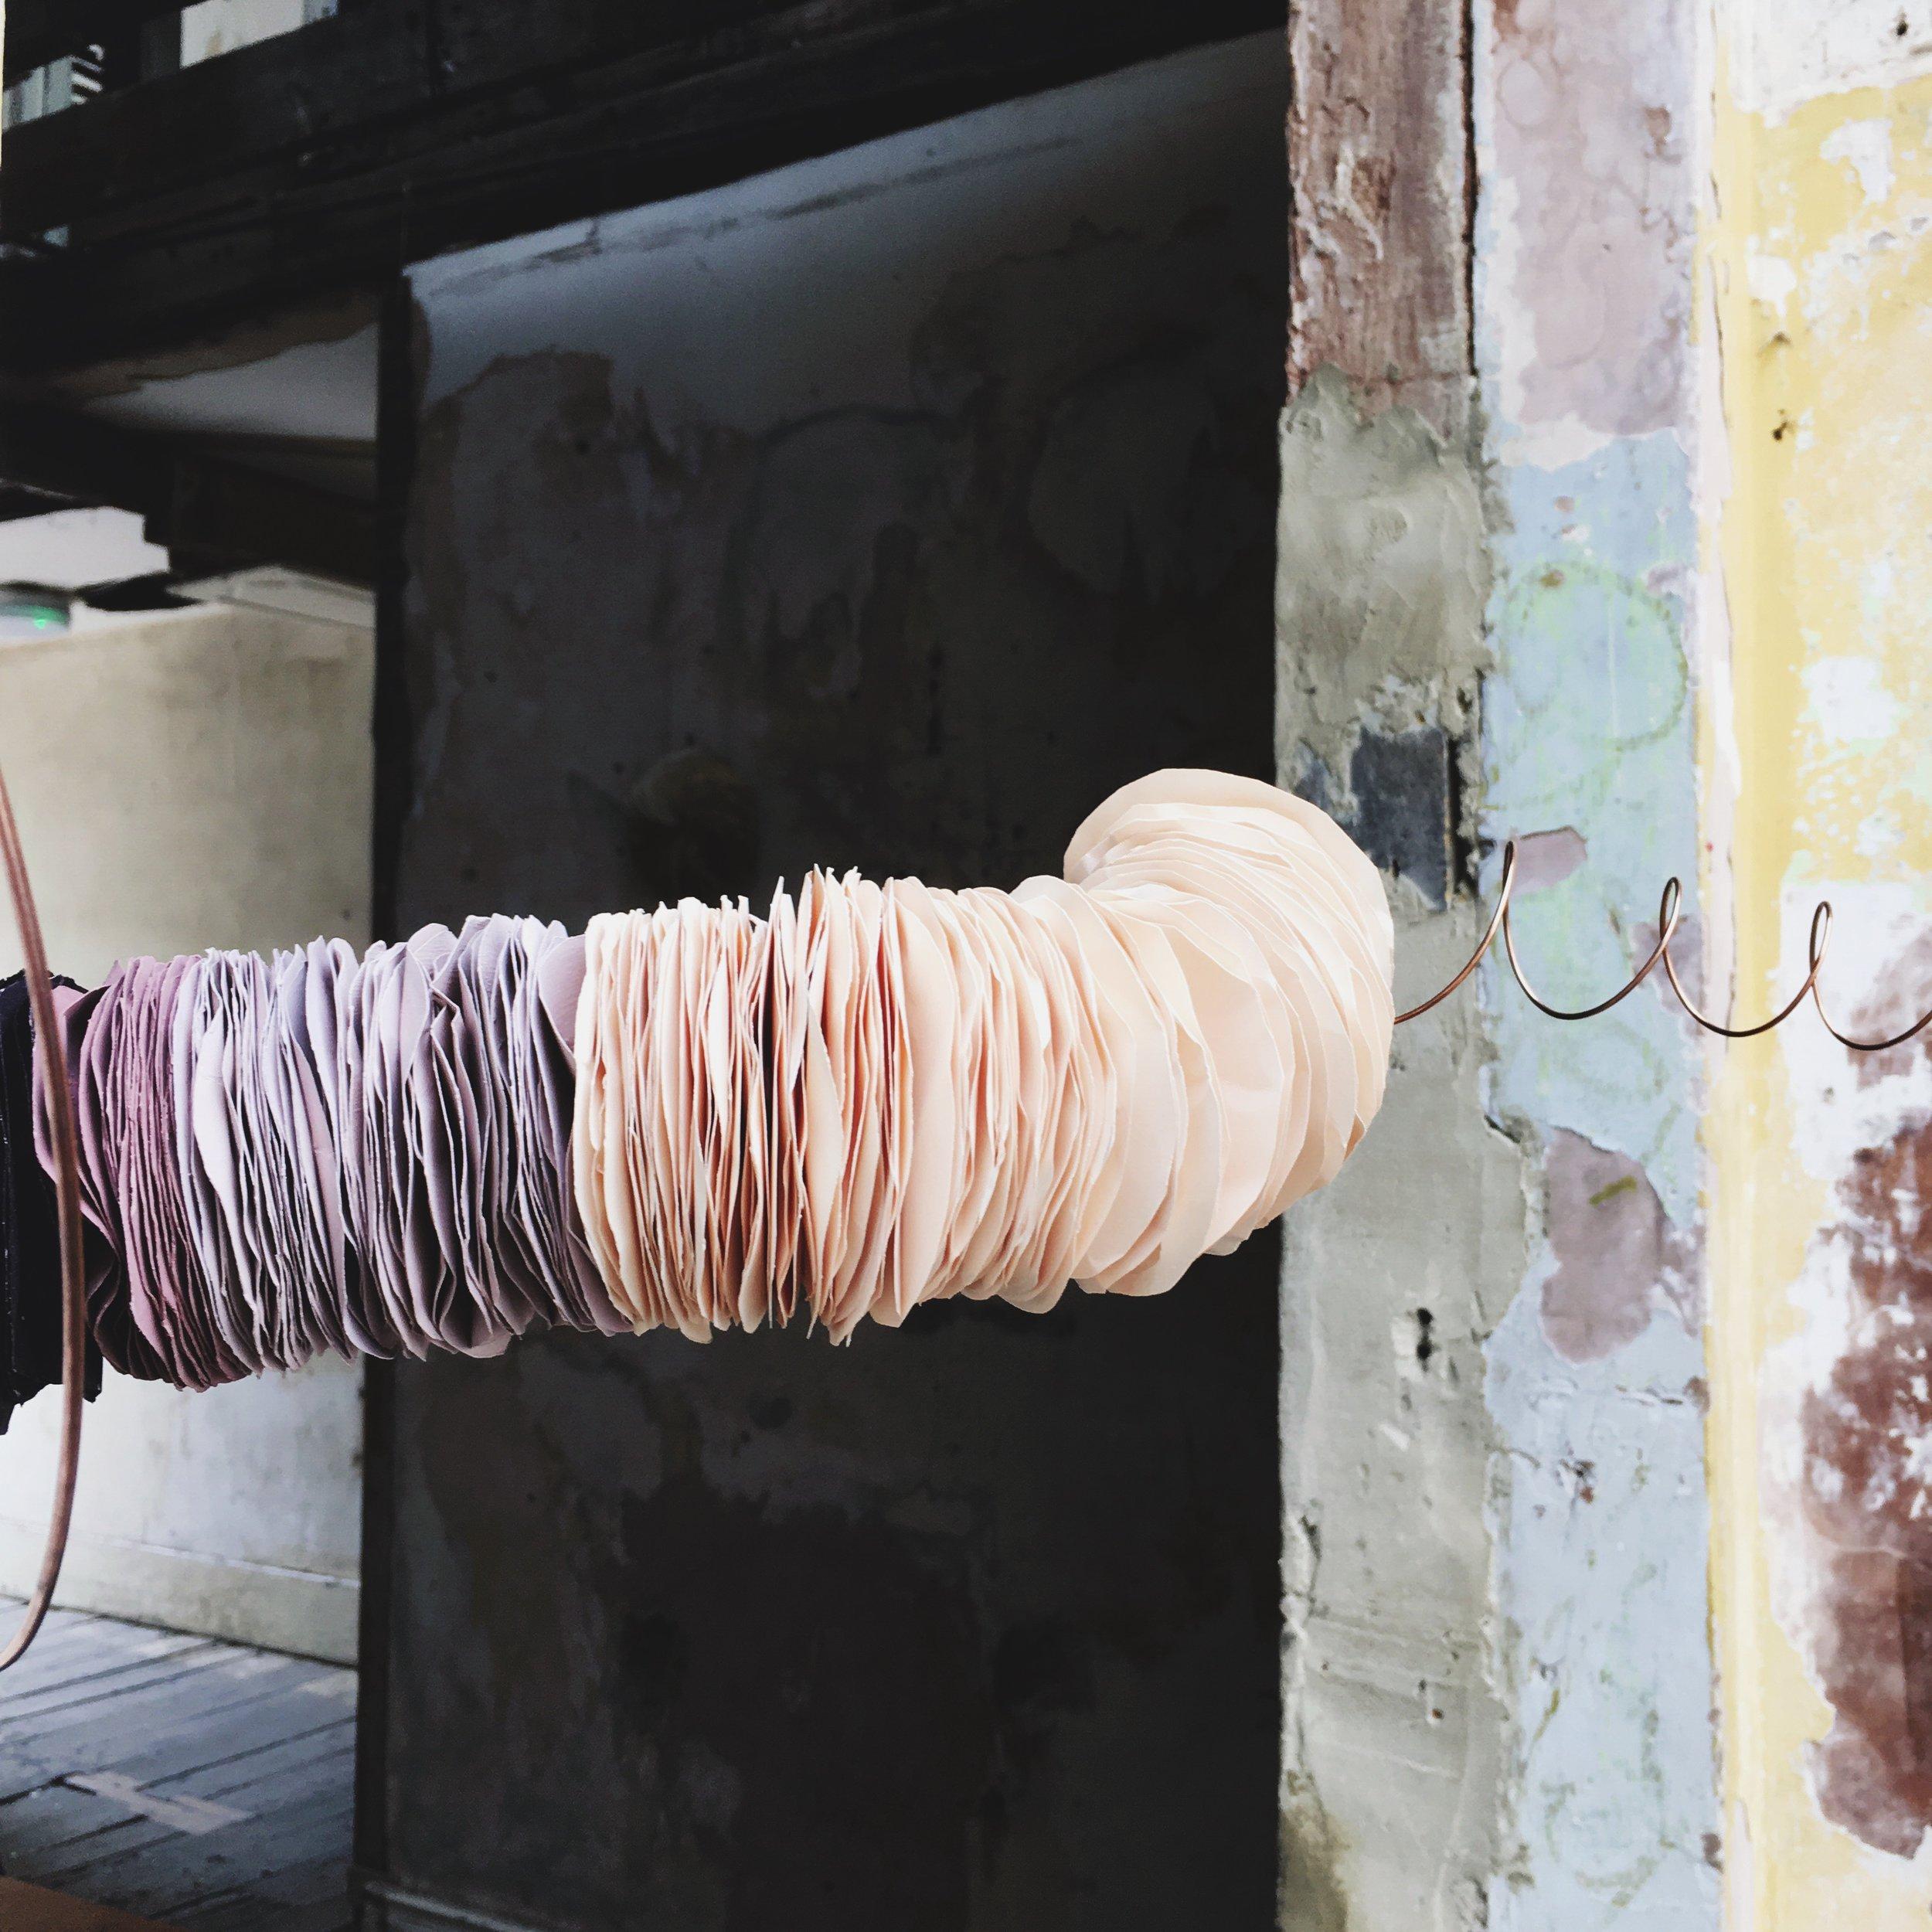 Paper sculpture 2016